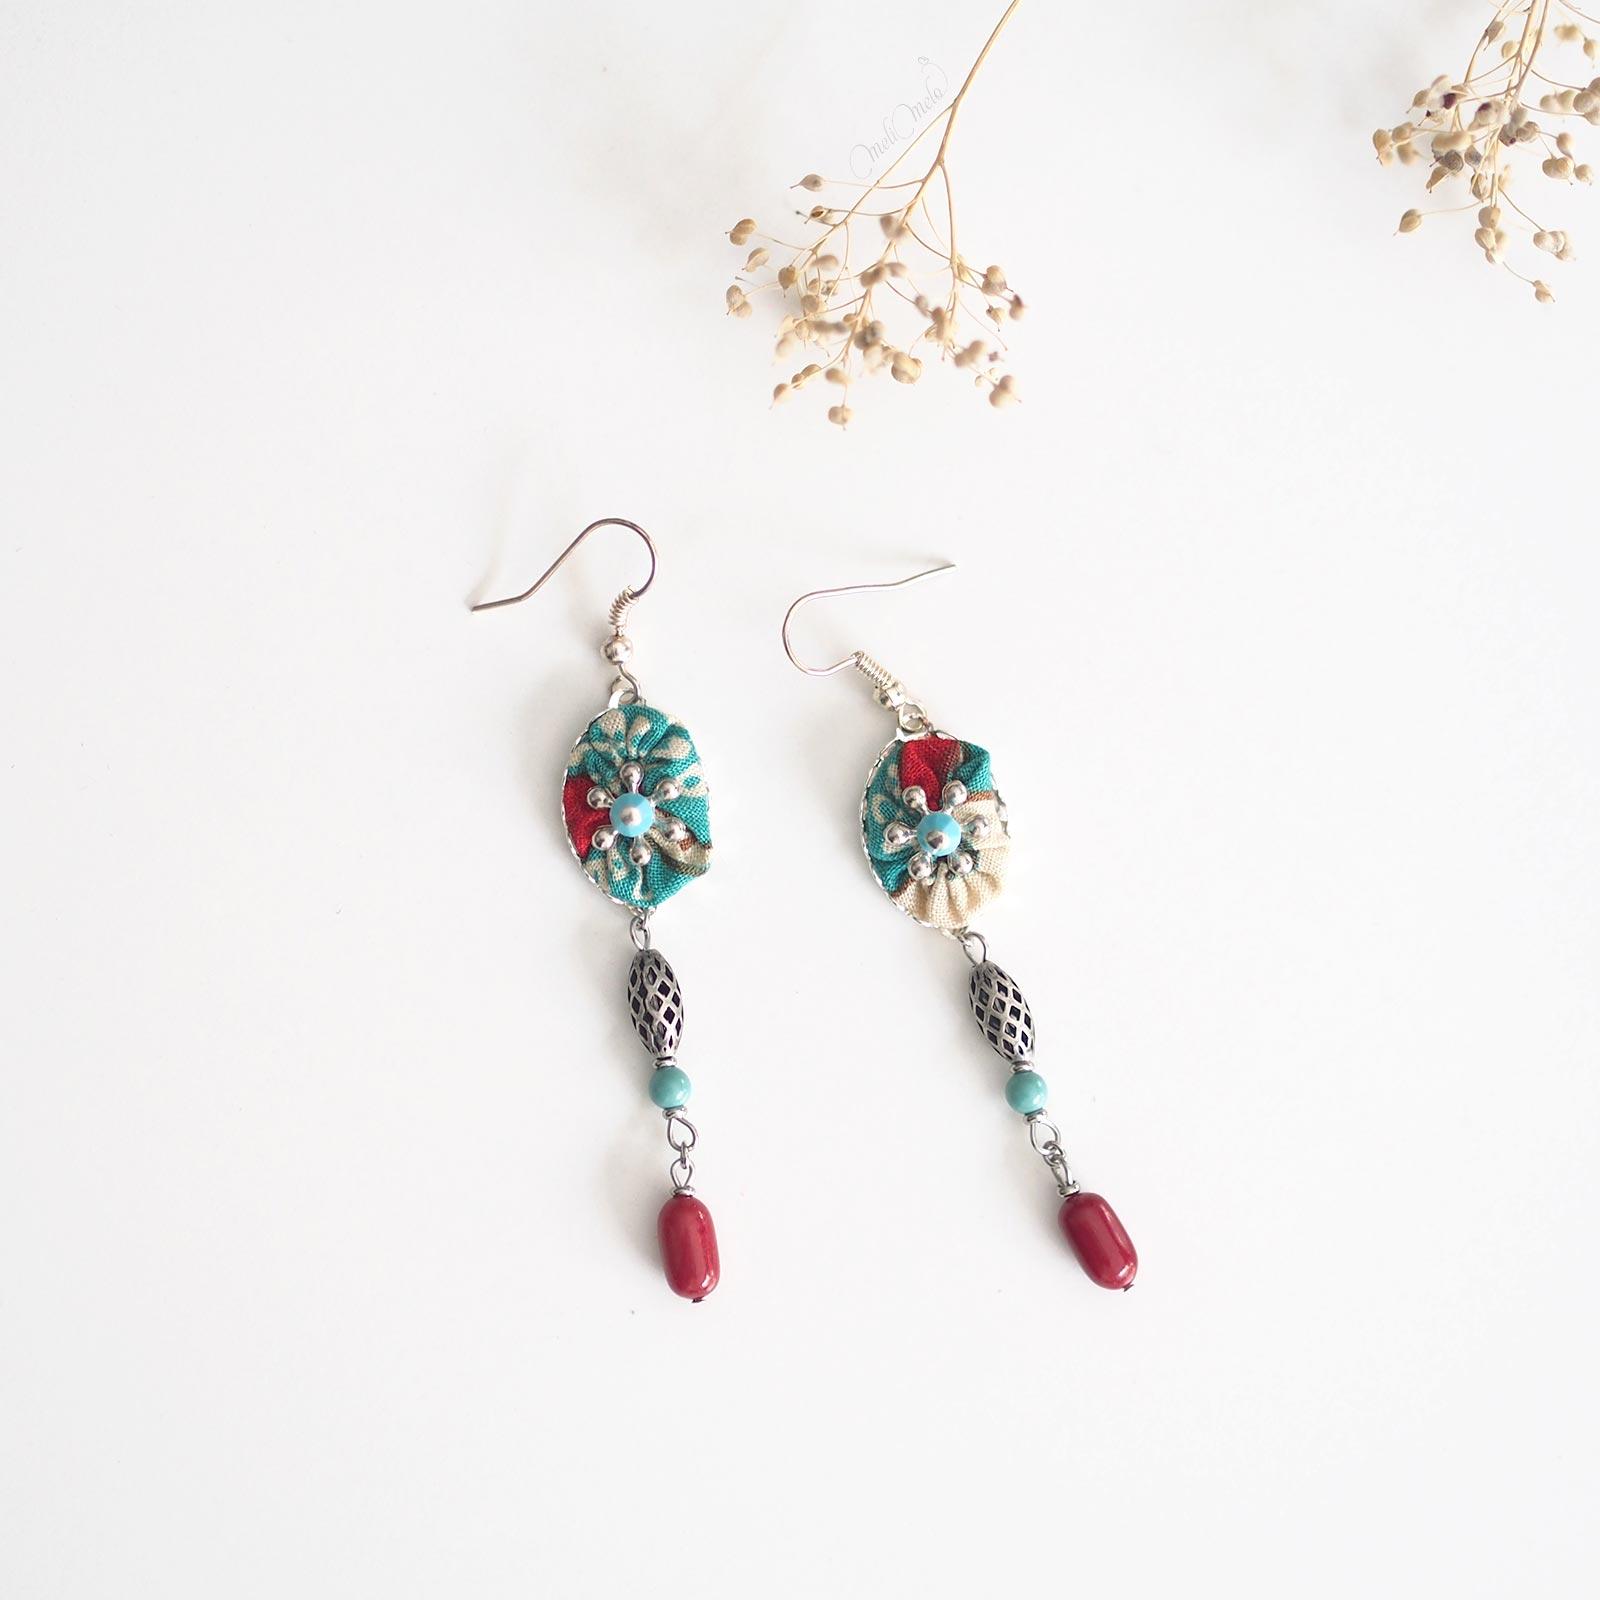 pendants oreilles Shakuyaku jaspe rouge cristal Swarovski argent laboutiquedemelimelo